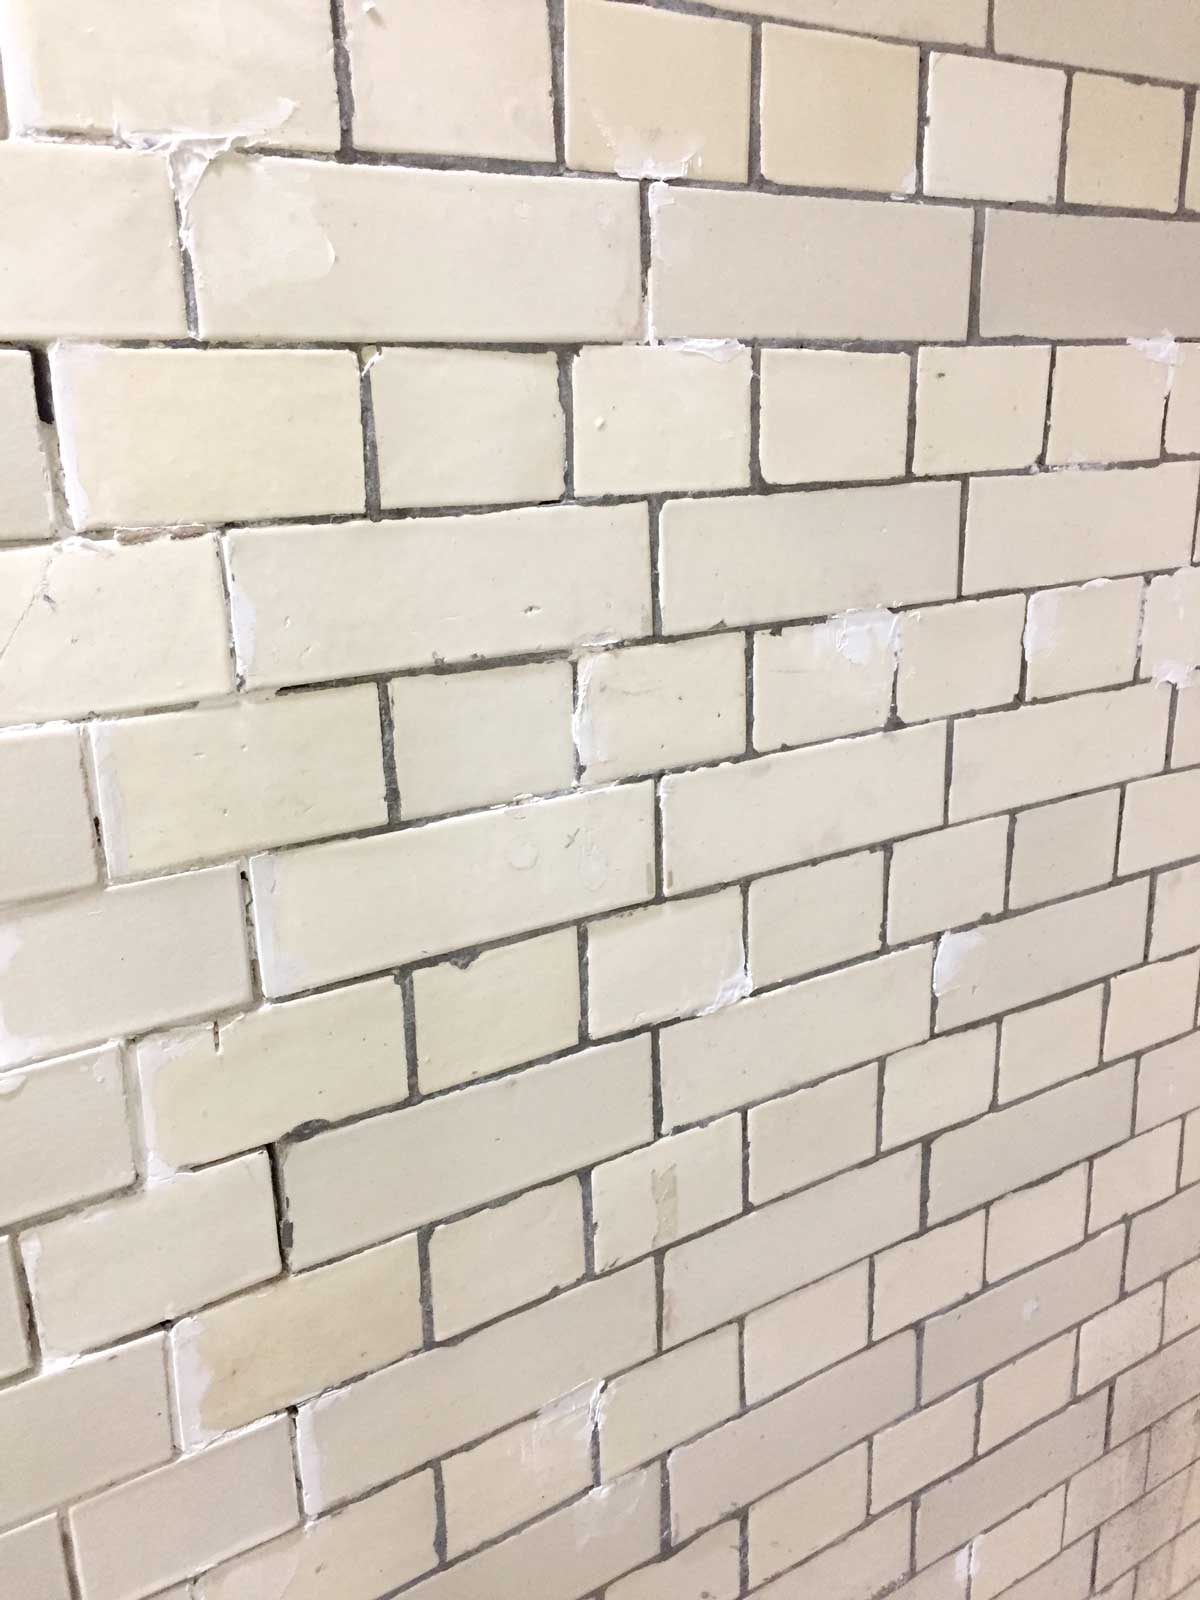 westminster-fire-station-existing-white-glazed-tiles